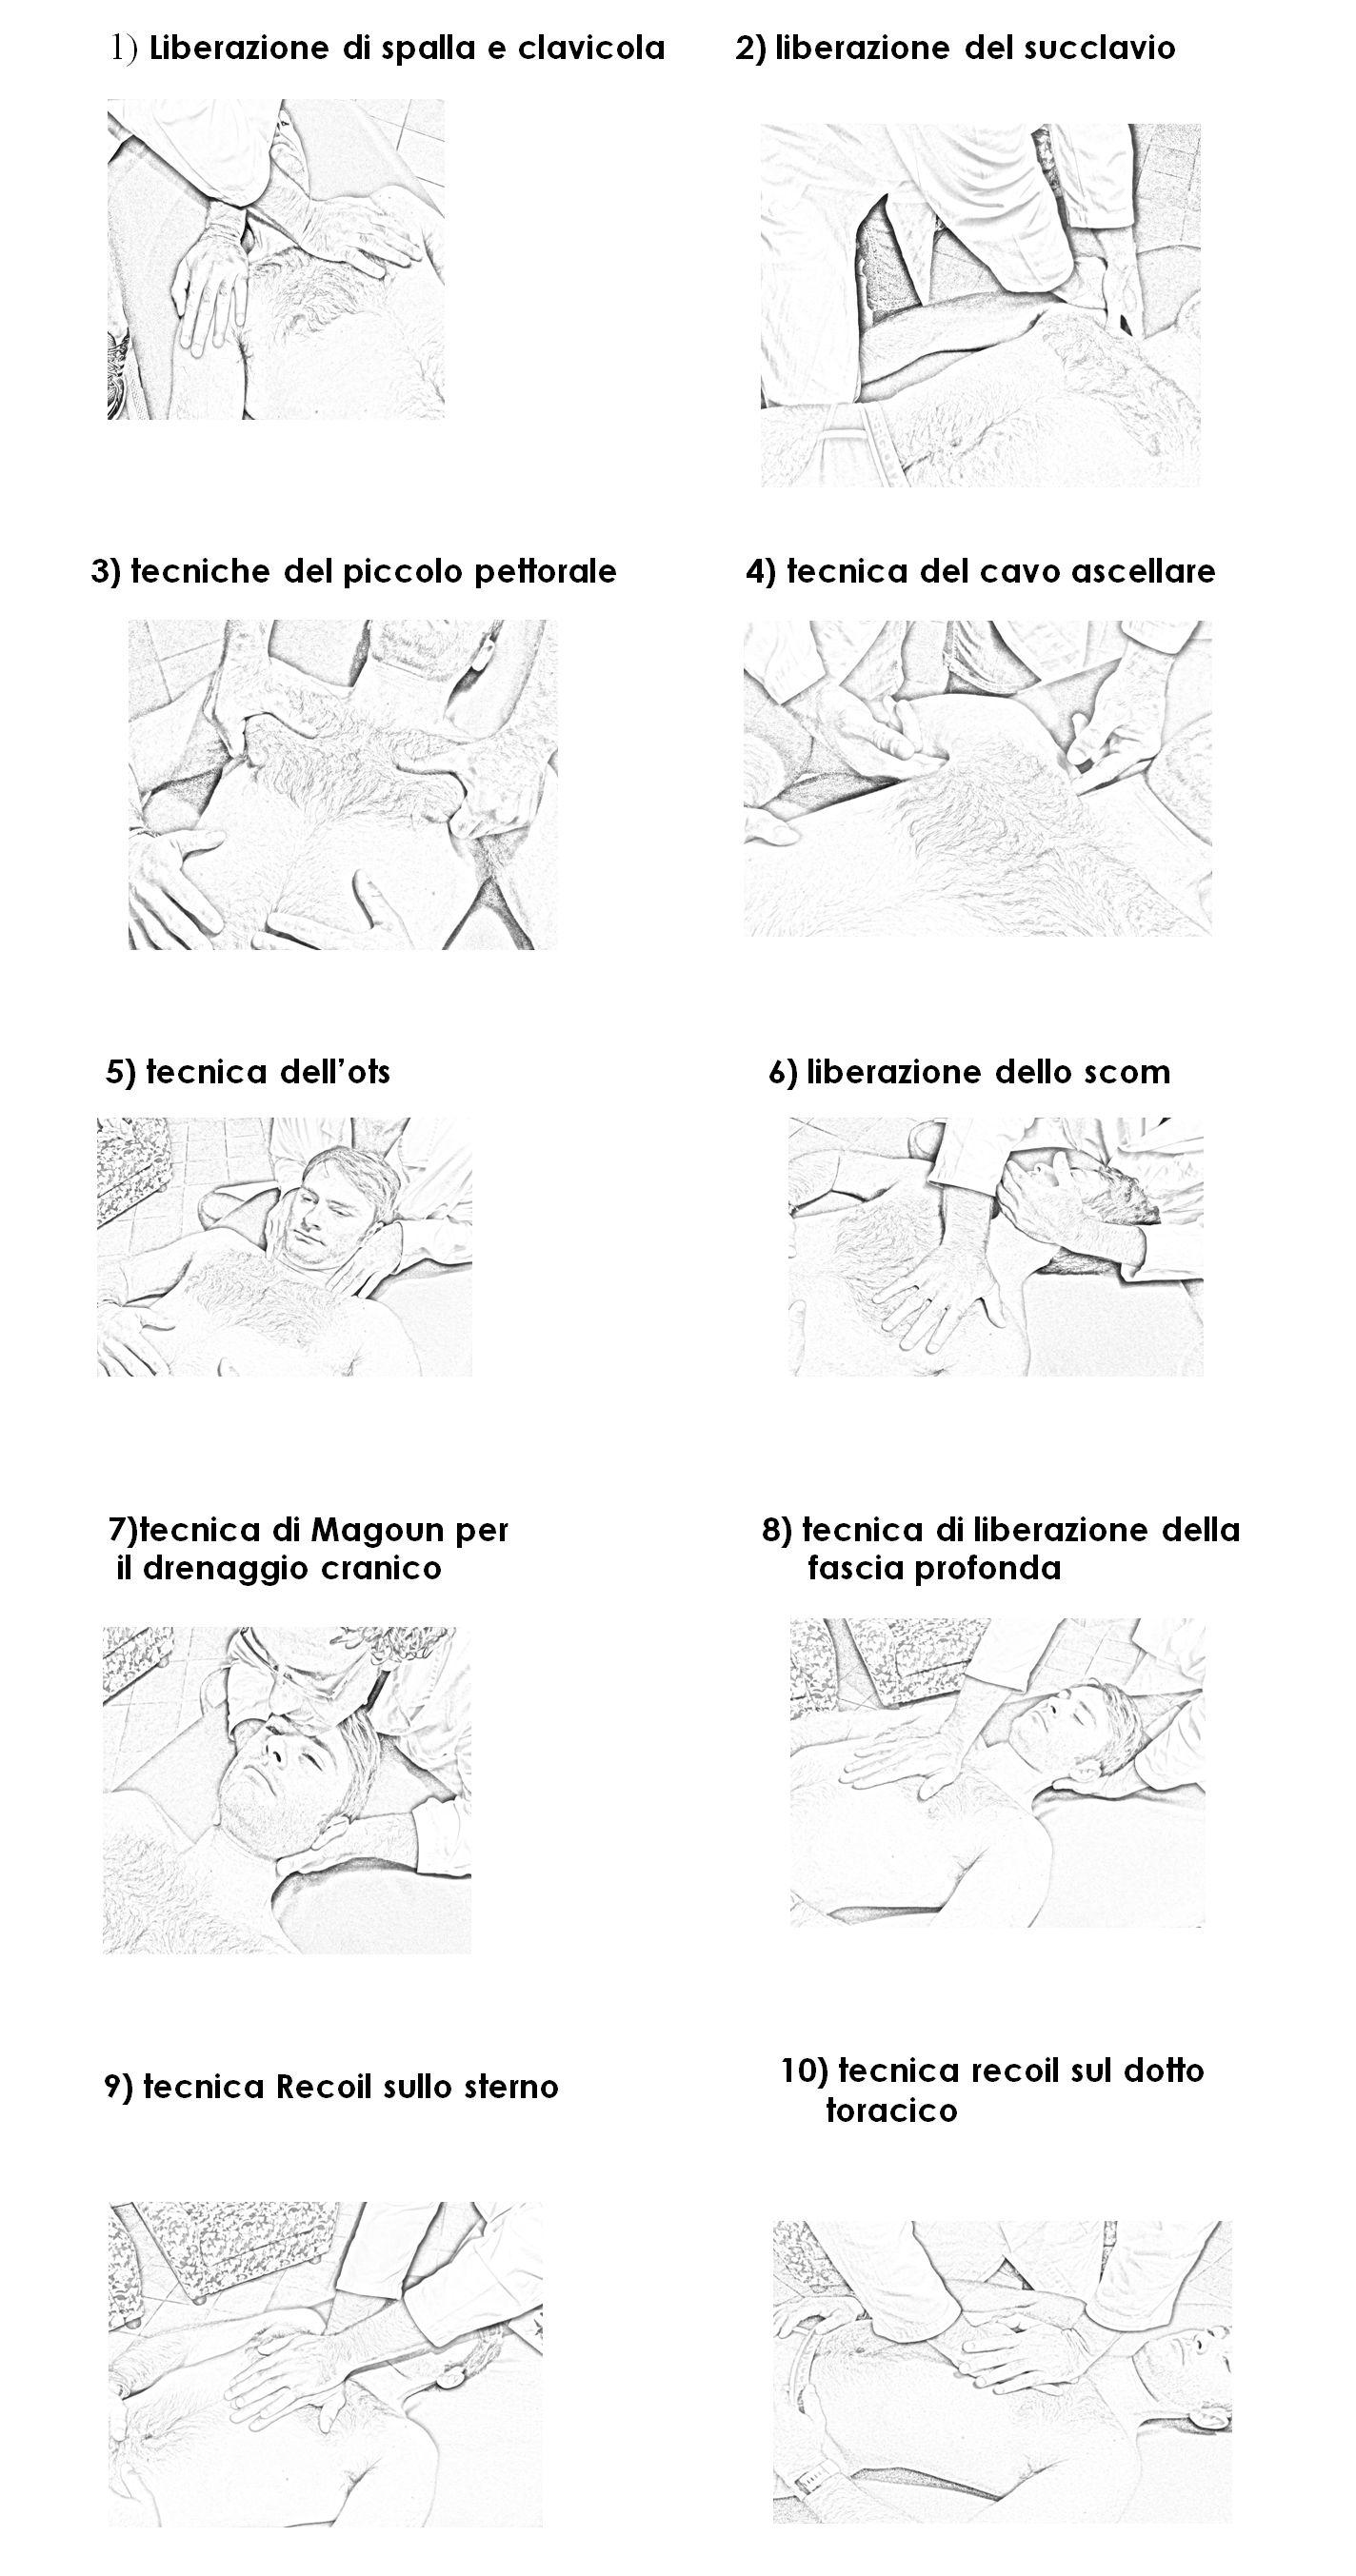 engineering mechanics statics rc hibbeler 13th edition solution manual pdf